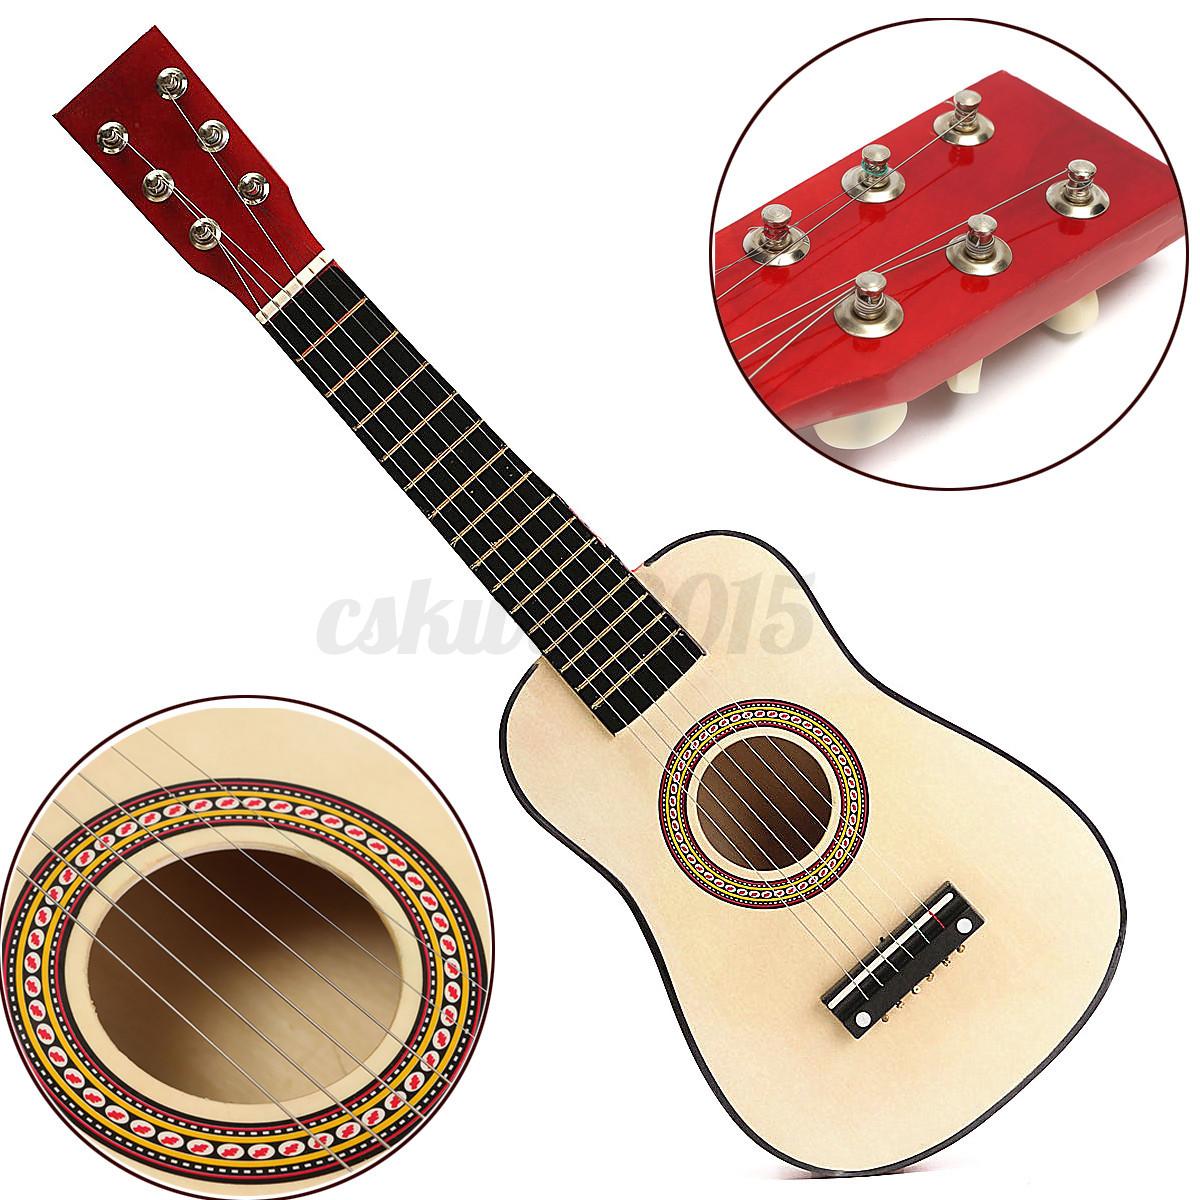 23 red wooden beginners practice acoustic guitar w 6 string for children kids ebay. Black Bedroom Furniture Sets. Home Design Ideas